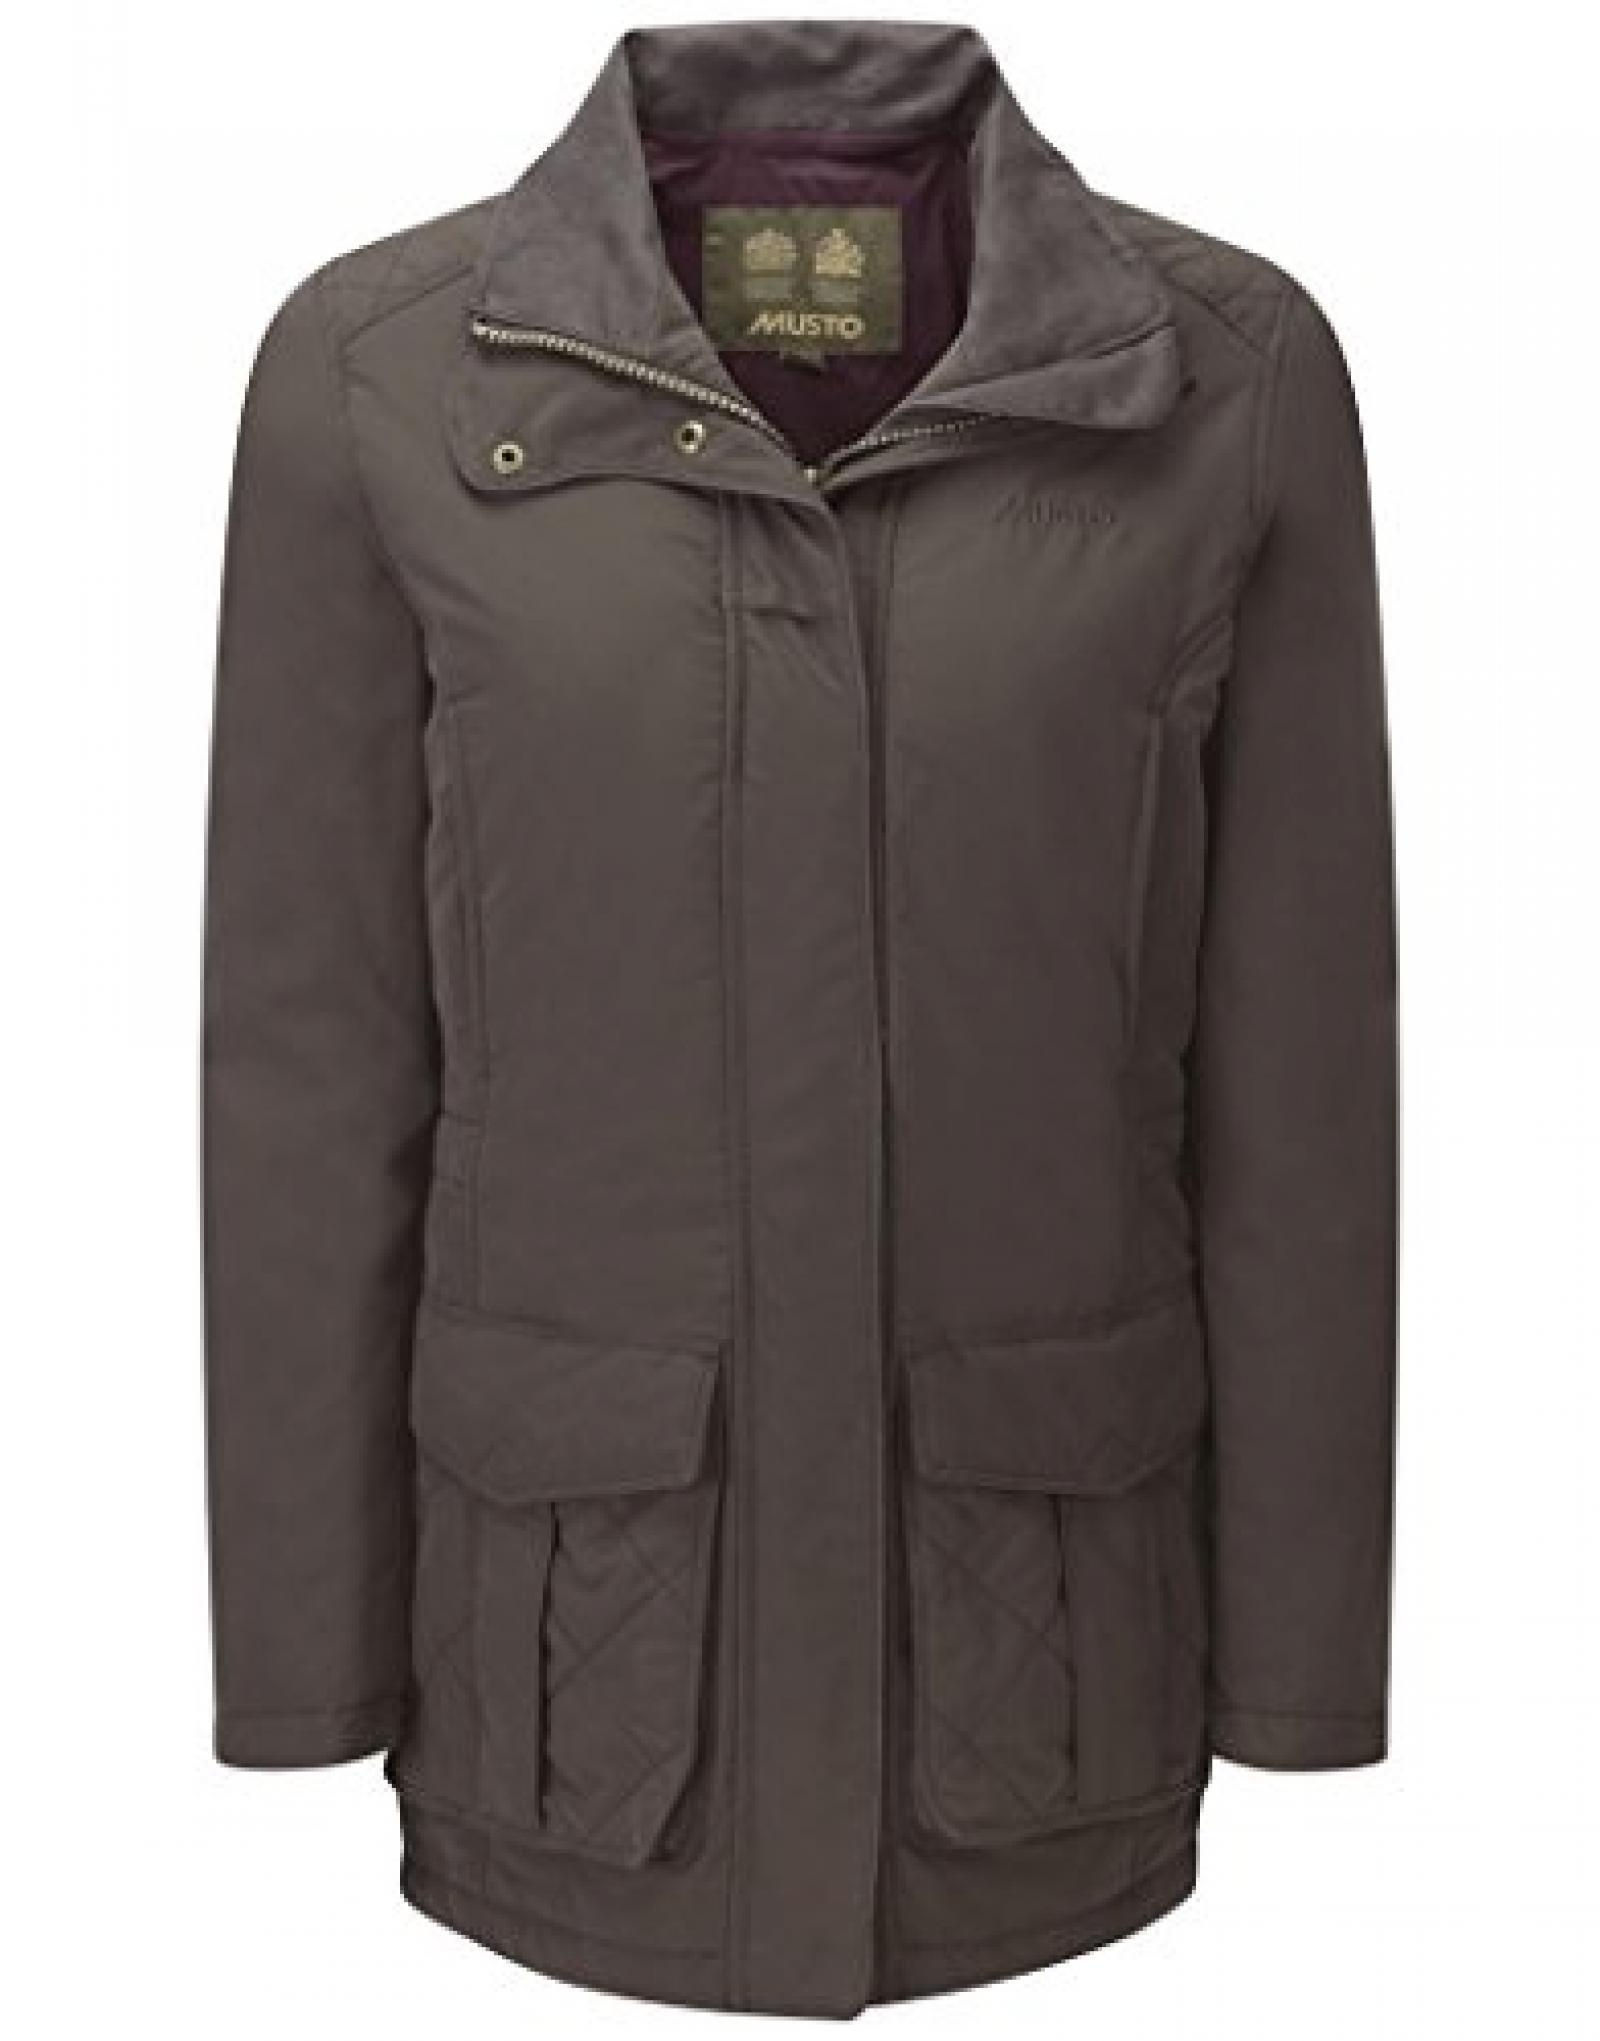 Musto Ladies? Sedgemoor Jacket ? Rich Brown